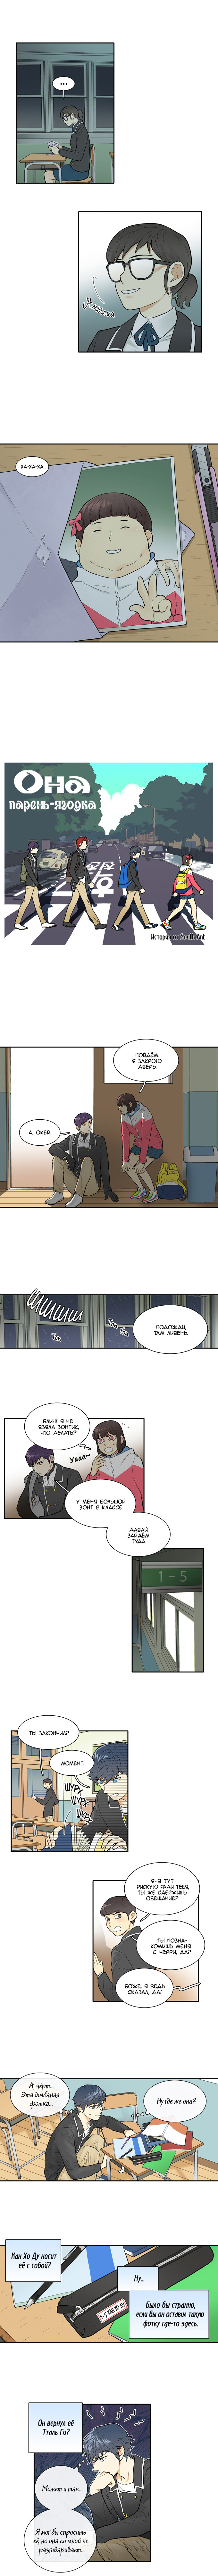 https://r1.ninemanga.com/comics/pic2/41/21609/214775/1428304619404.jpg Page 3